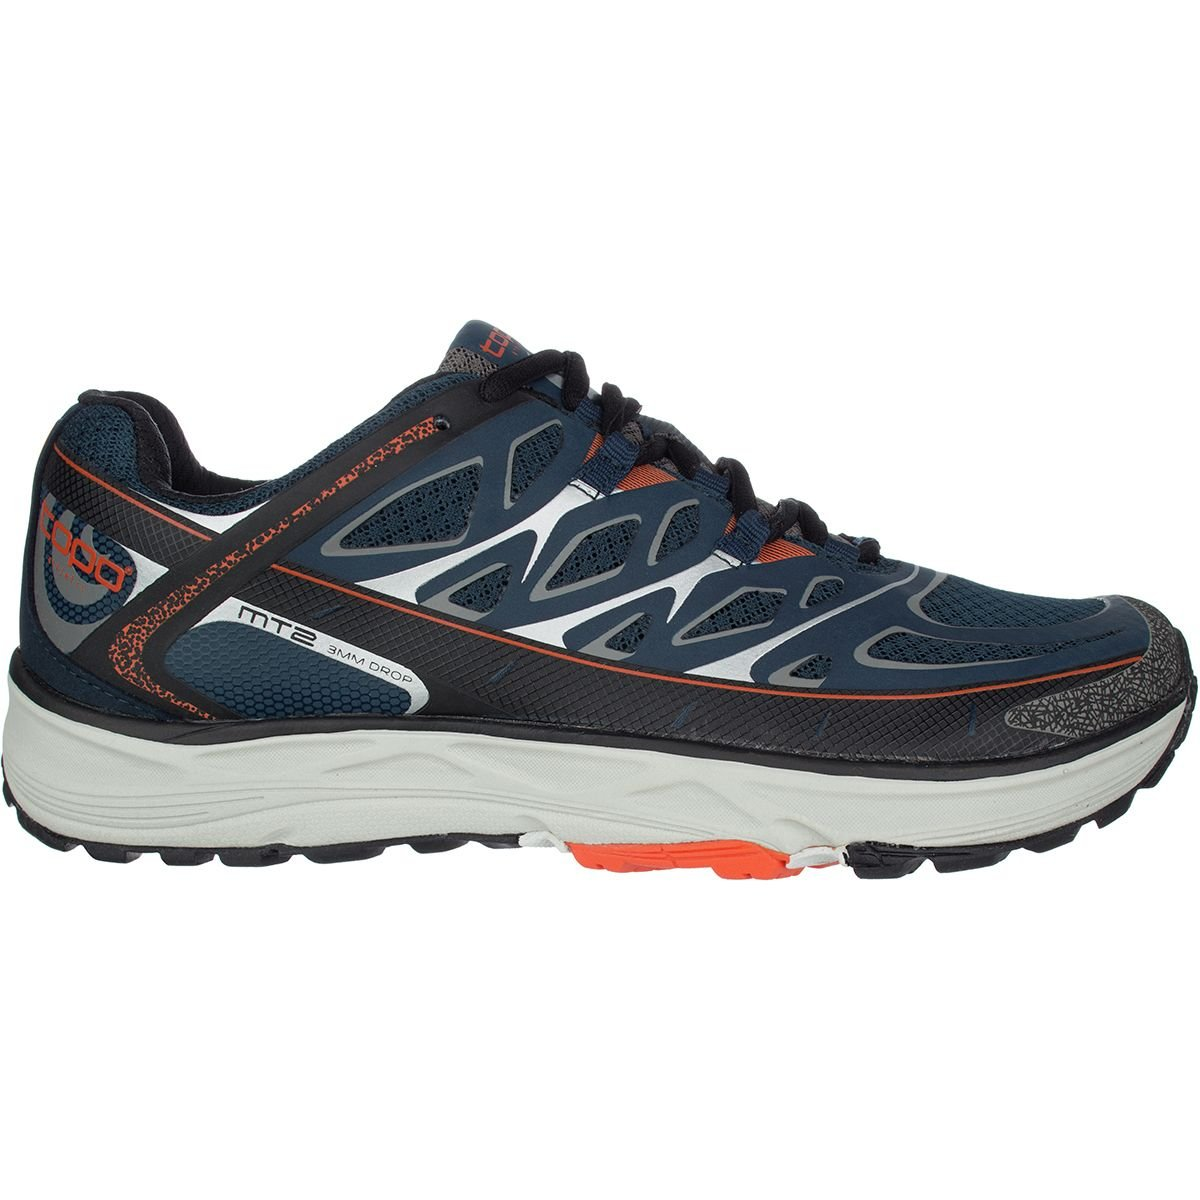 Topo Athletic mt2 Running Shoe – Men 's B06W5895F4 11.5 D(M) US|Navy/Grey Navy/Grey 11.5 D(M) US